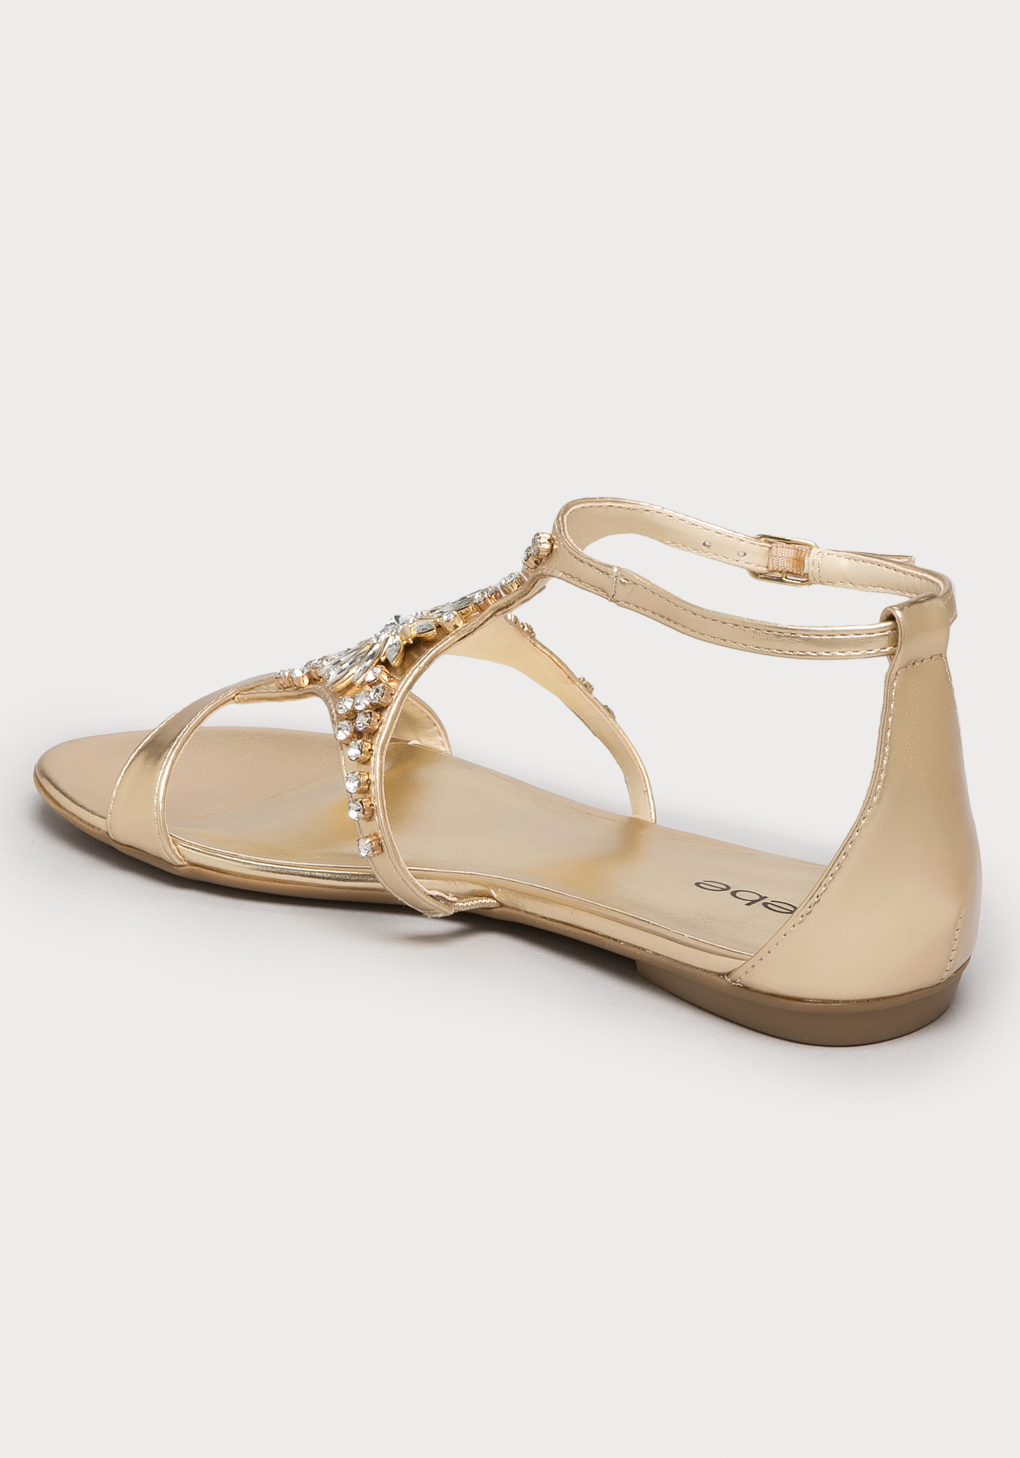 c2d0e44d9abf26 Lyst - Bebe Jaden Jeweled Flat Sandals in Metallic